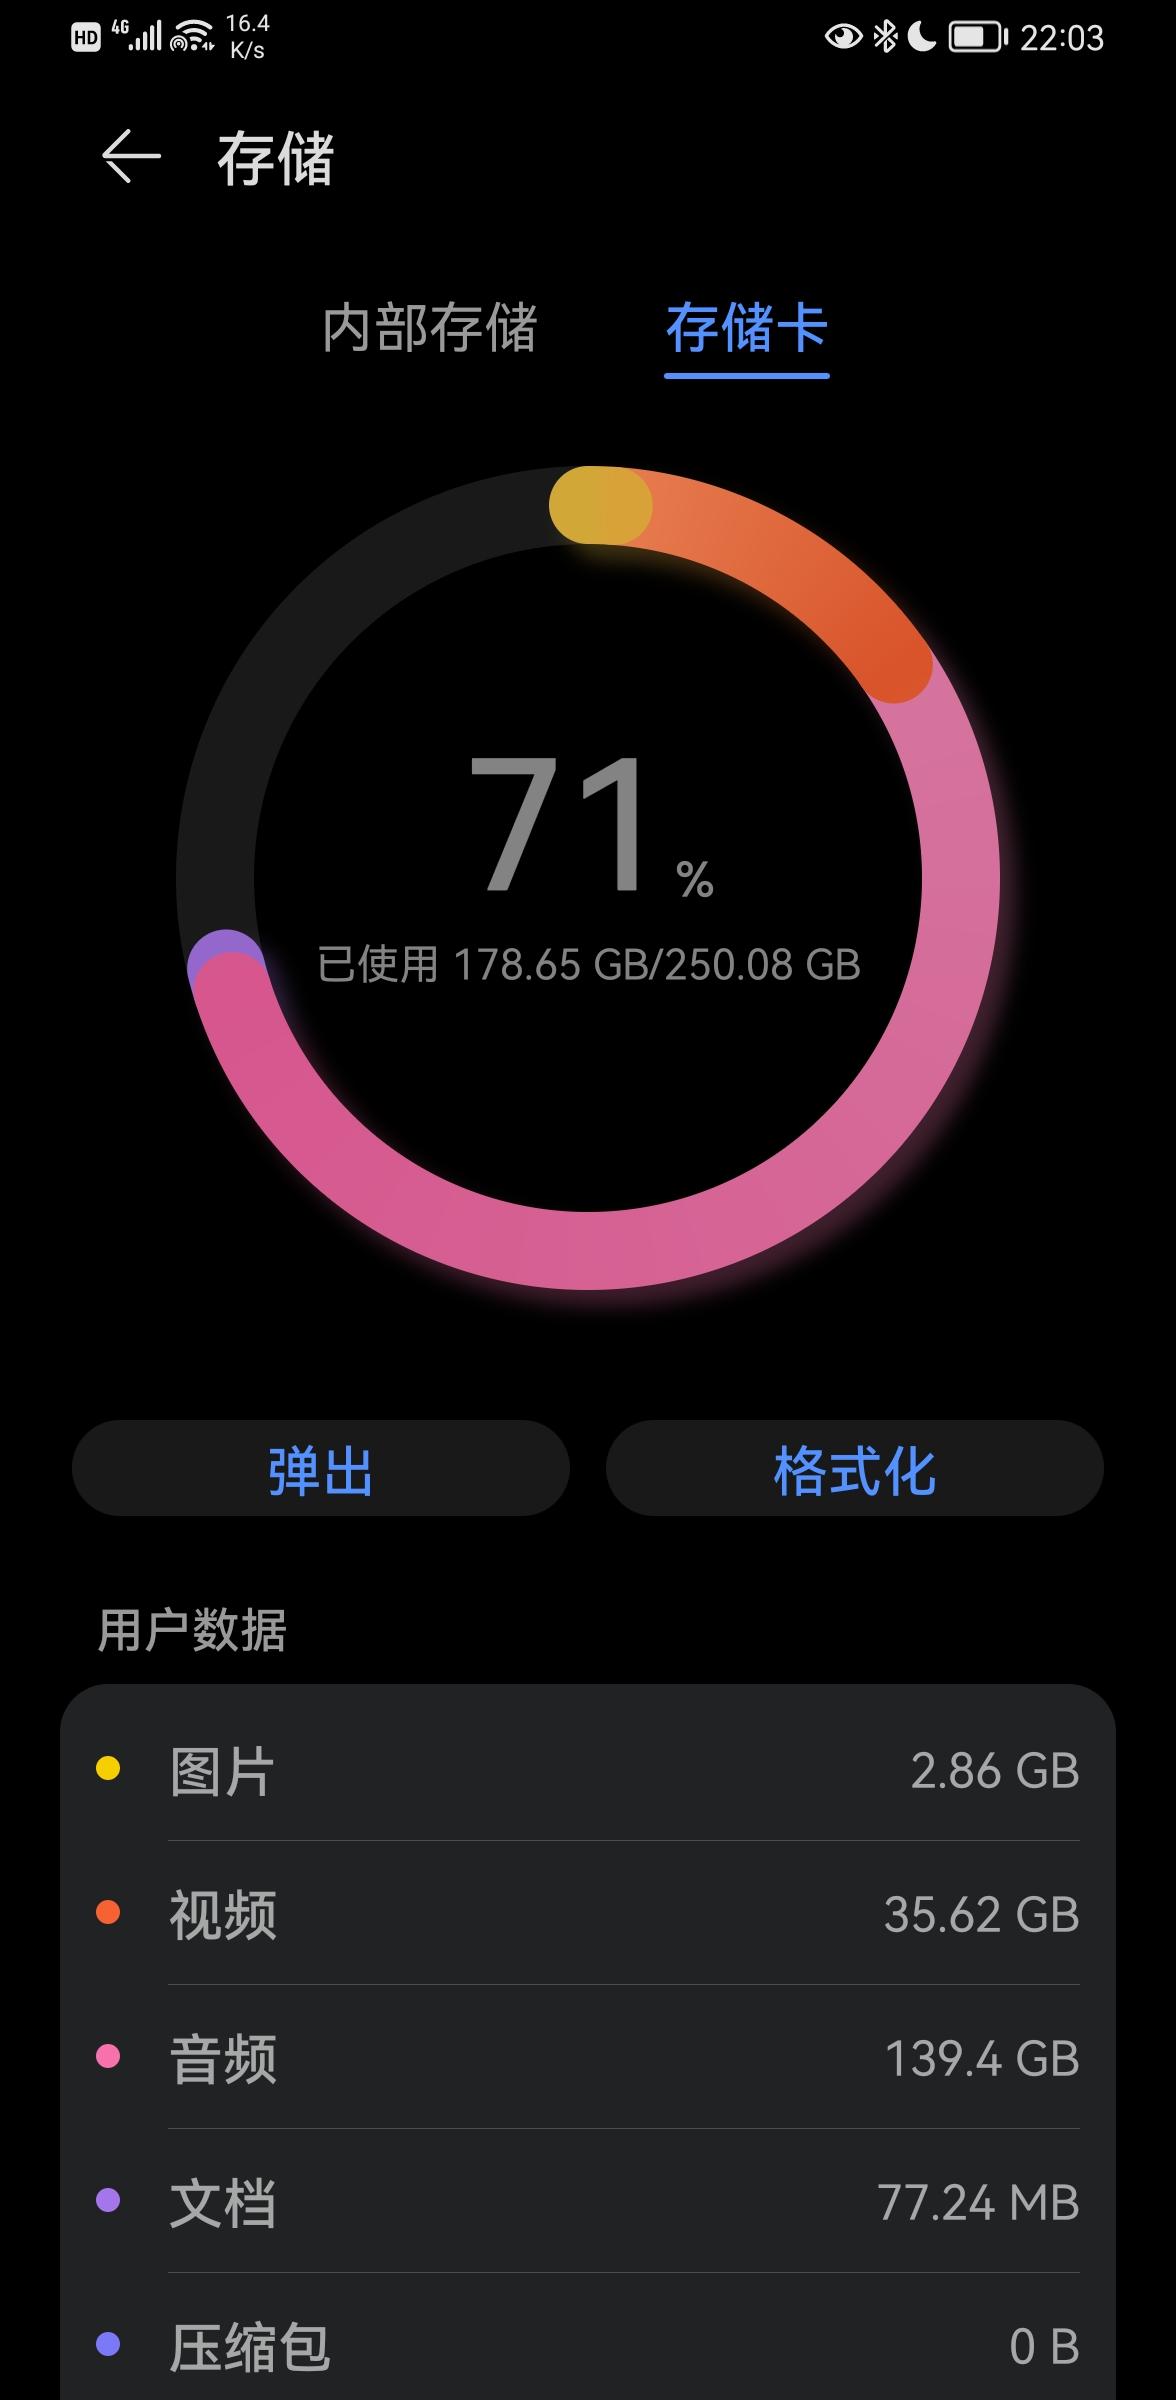 Screenshot_20210611_220320_com.android.settings.jpg